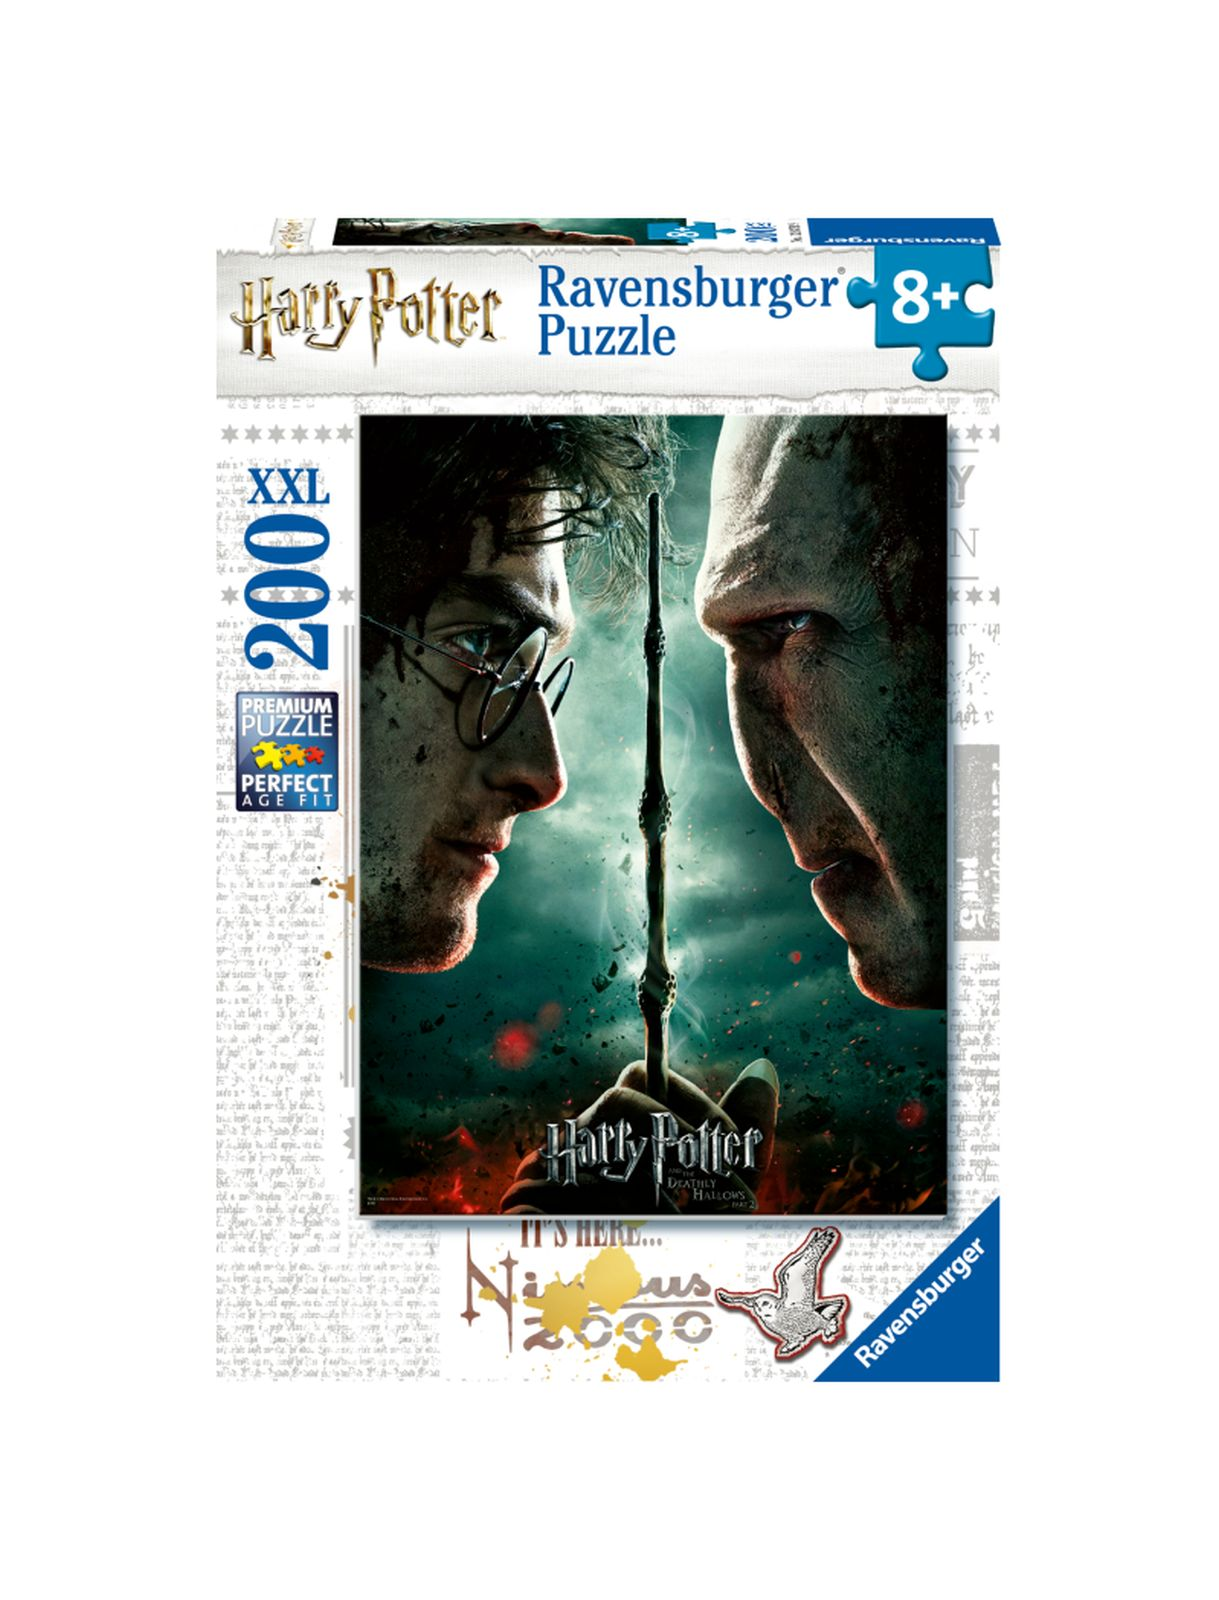 Ravensburger - puzzle 200 pezzi xxl - harry potter - Ravensburger1